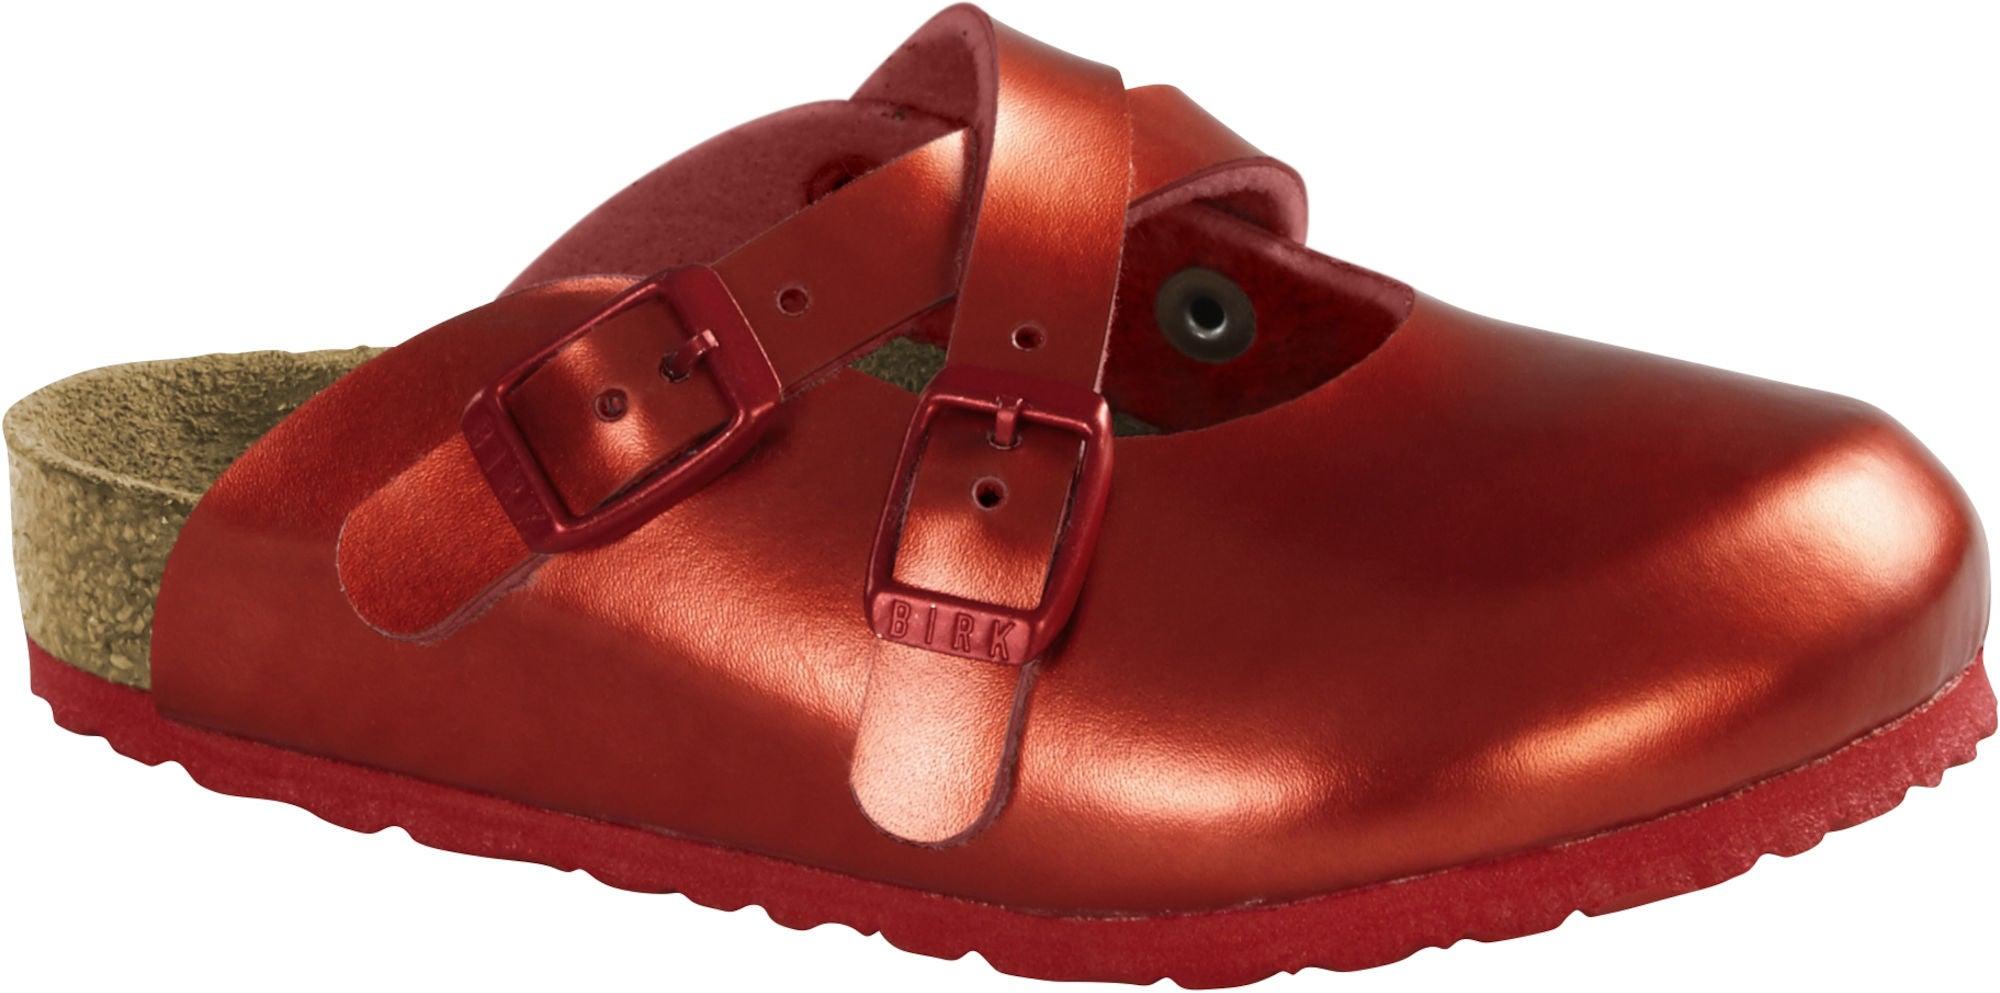 Kaufen Birkenstock Dorian Kids Sandalen, Metallic Red